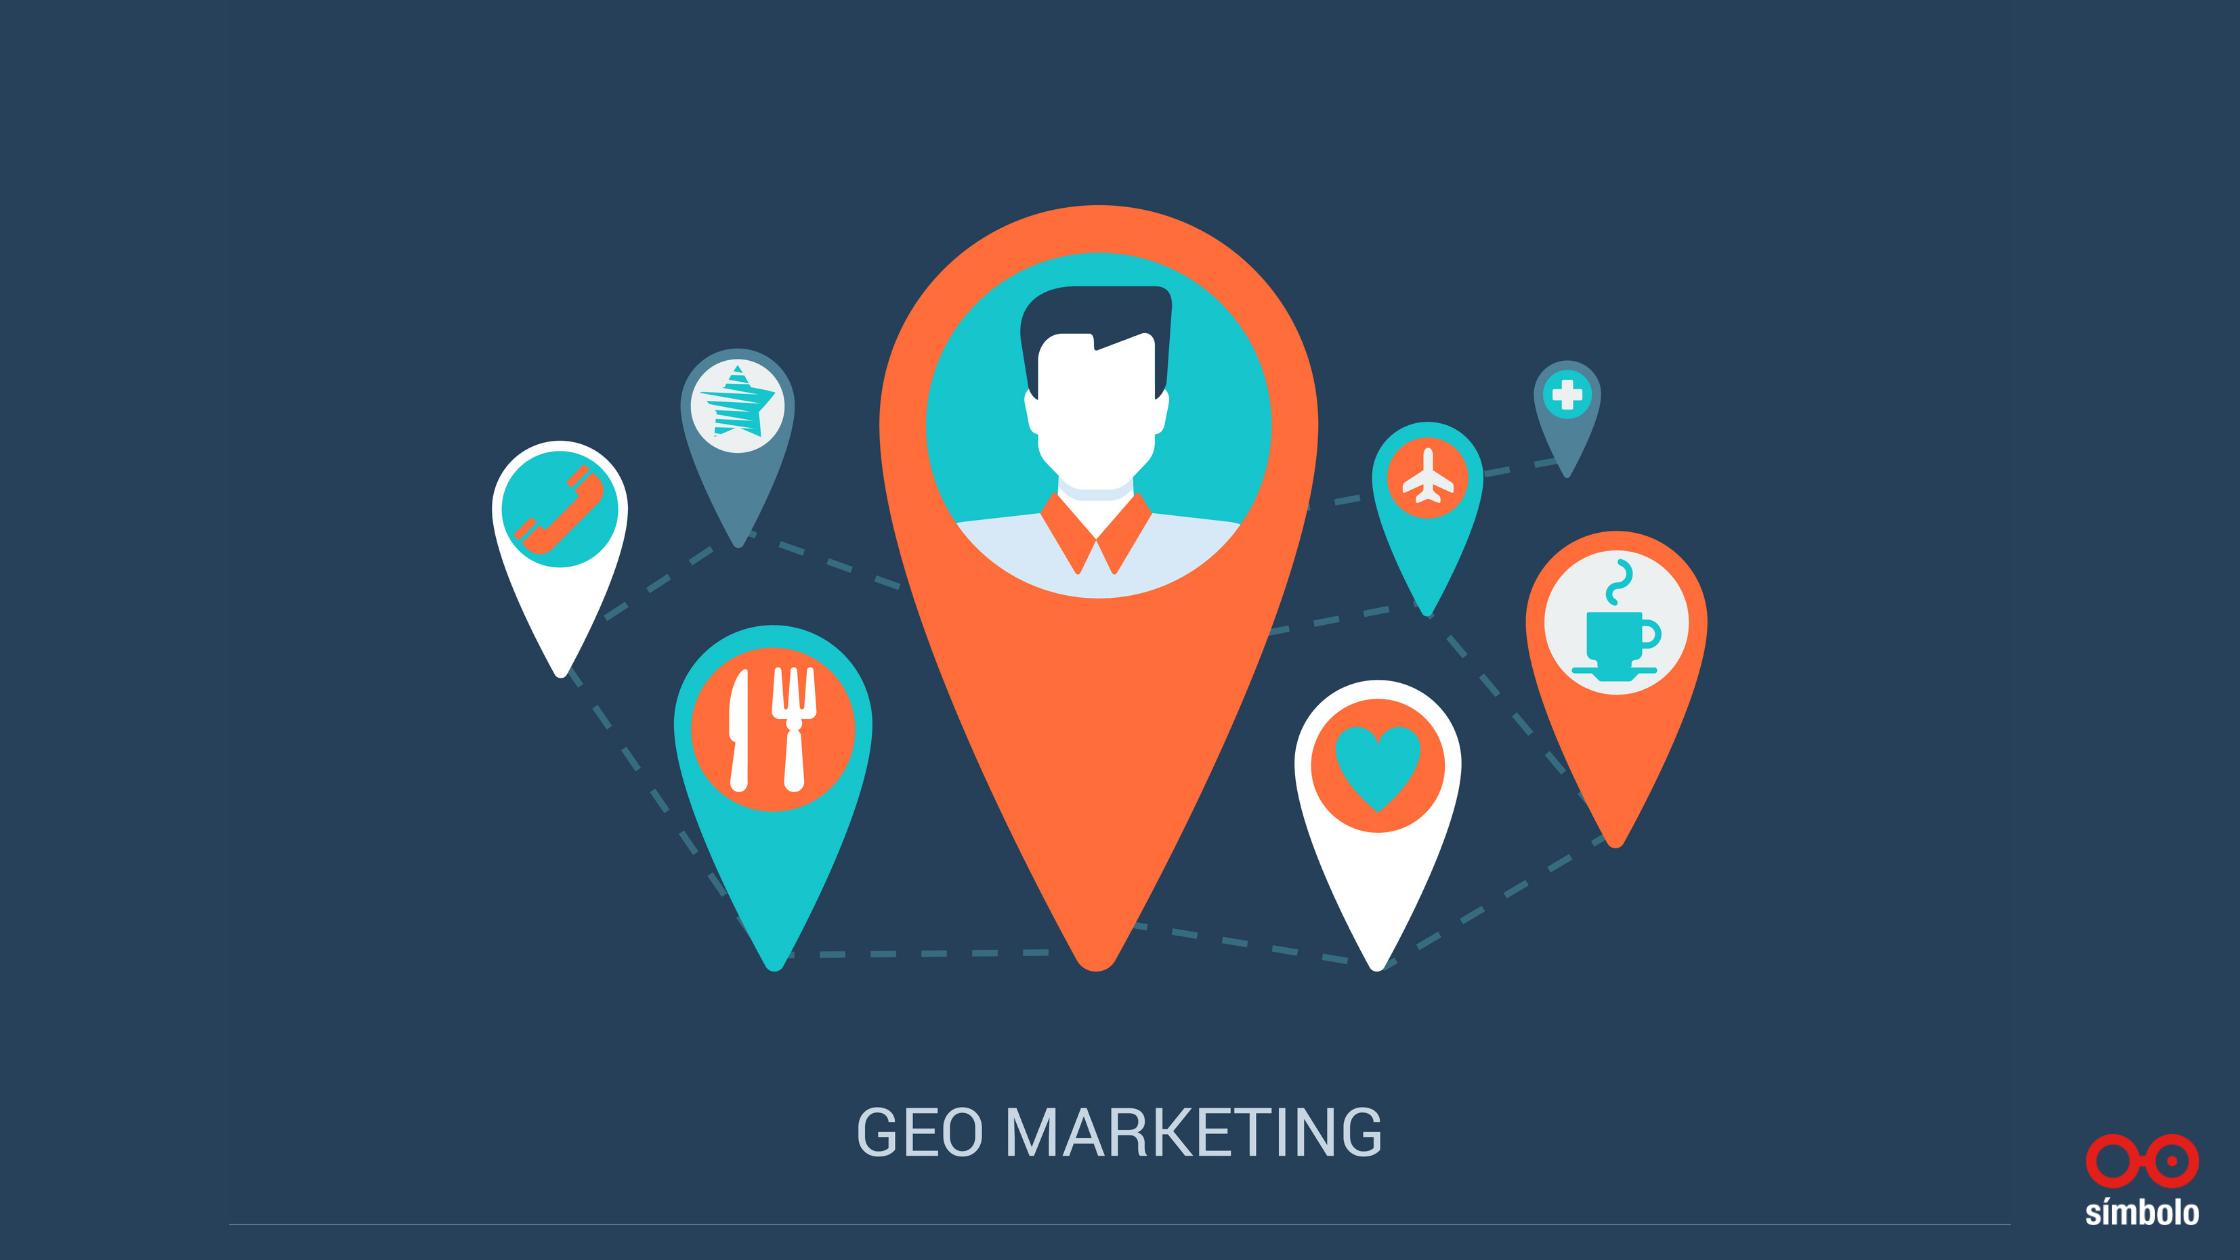 Geomarketing en Simbolizate